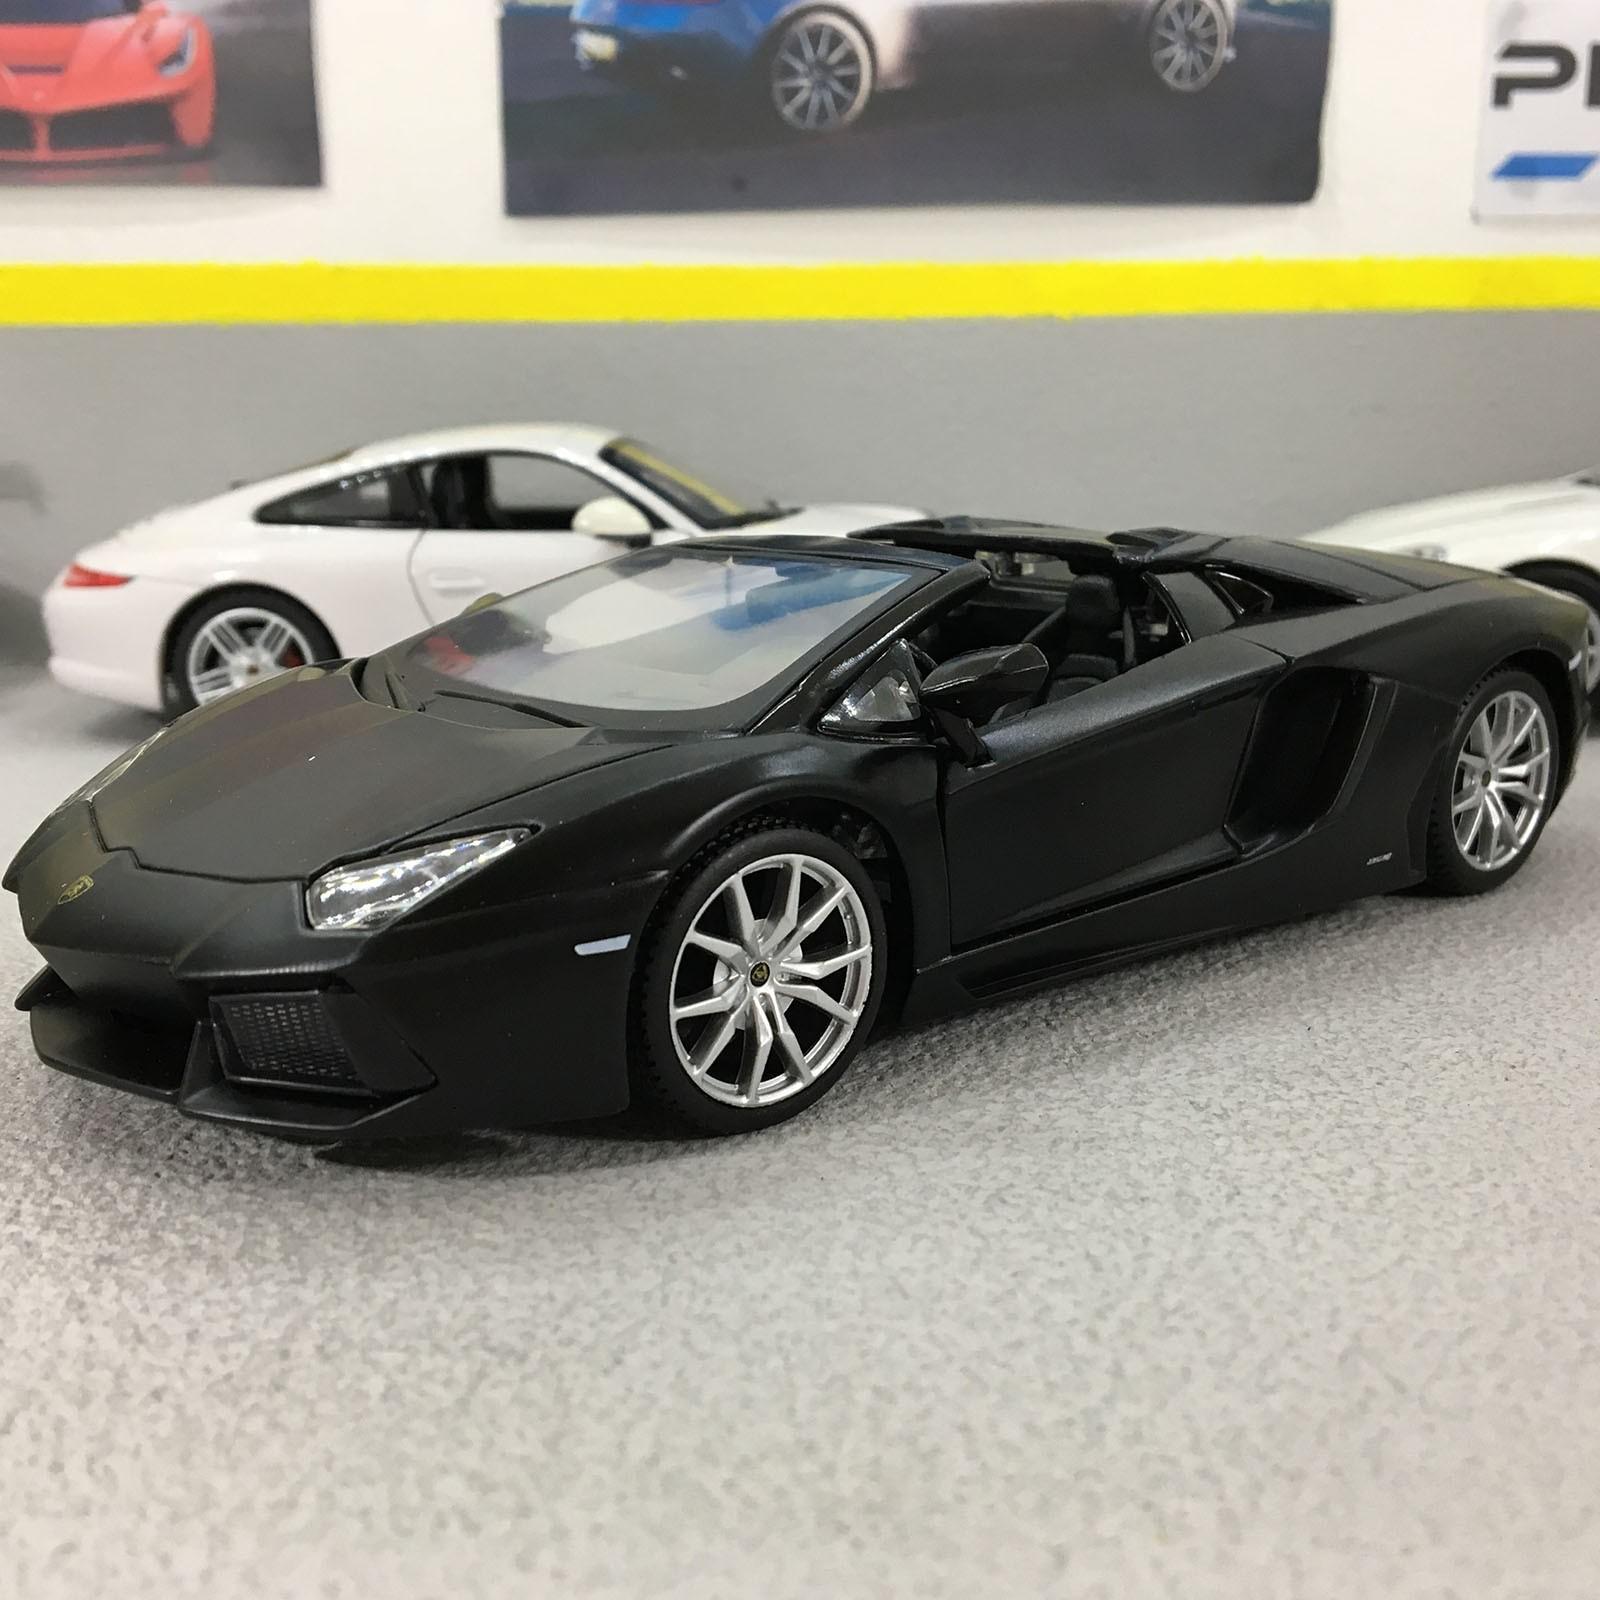 Lamborghini Aventador Lp700 4 Roadster Black 1 24 Scale Die Cast